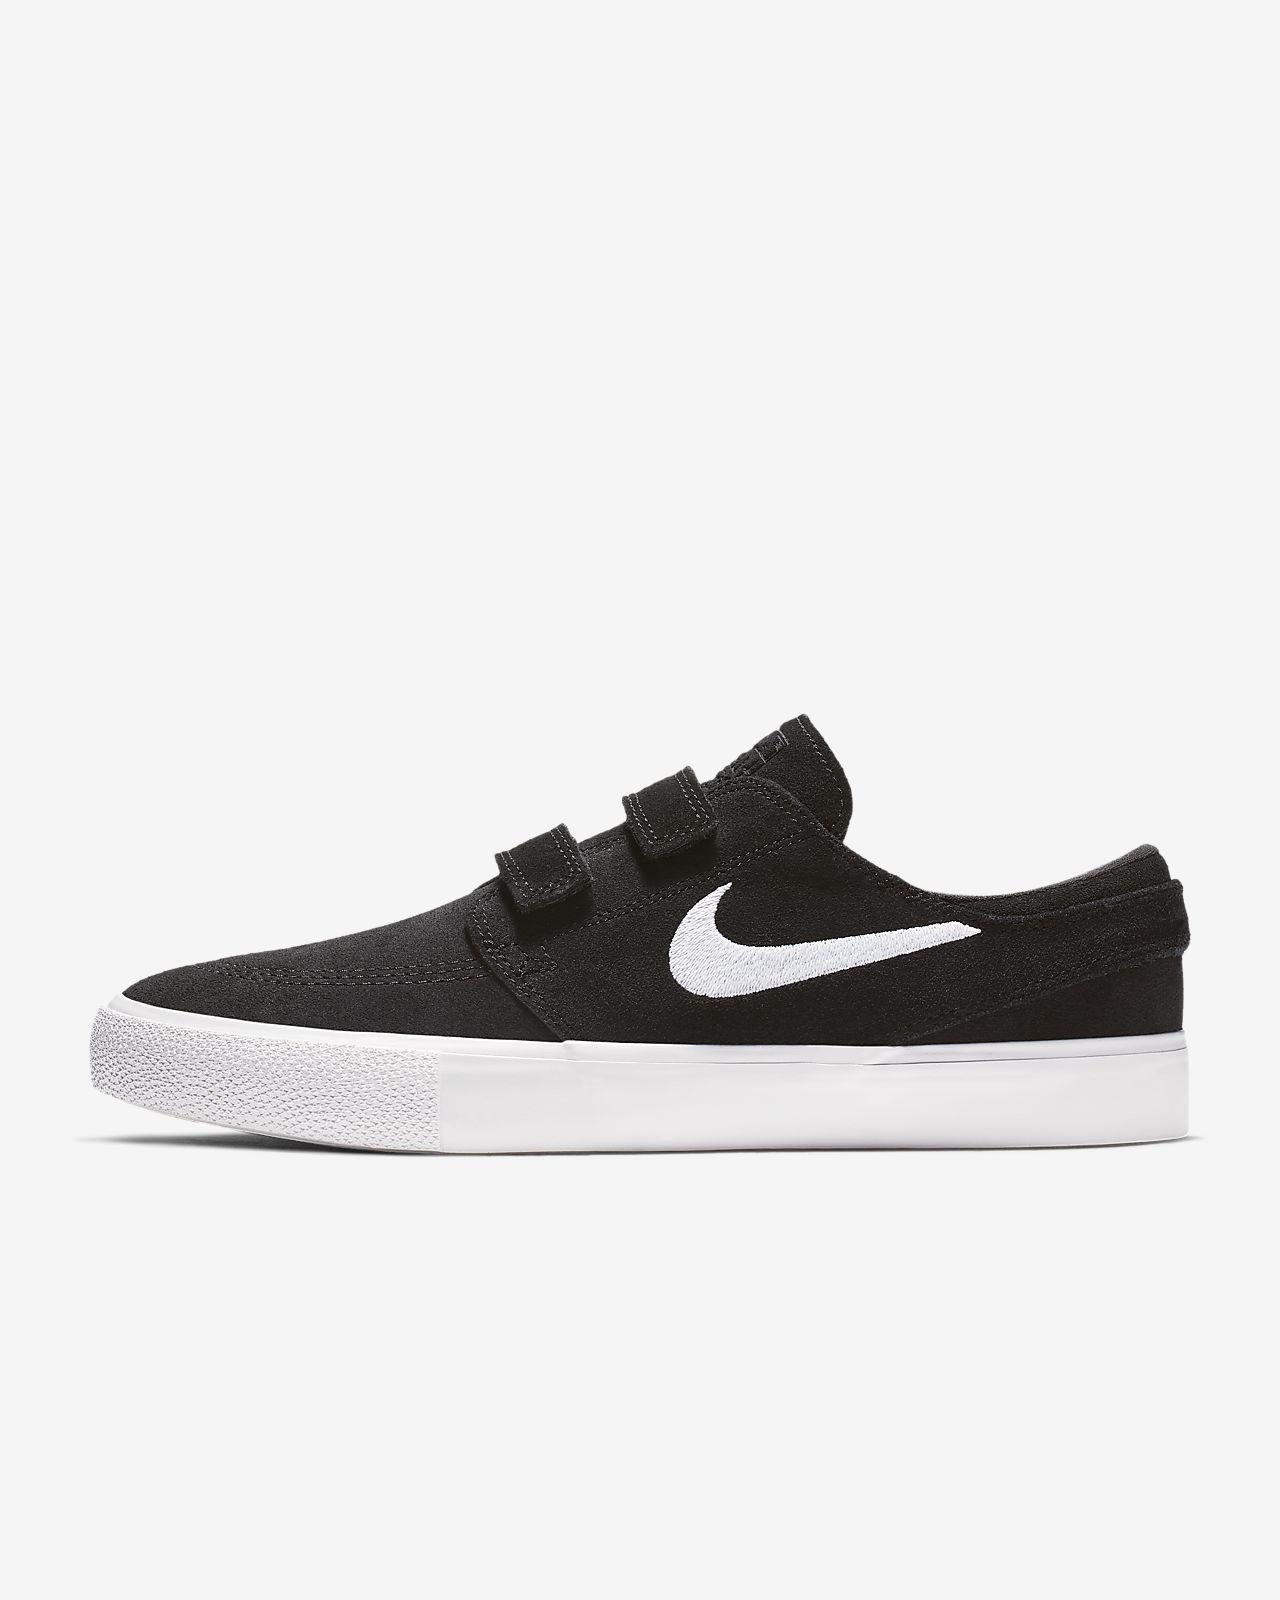 Nike SB Zoom Stefan Janoski AC RM Skate Shoe